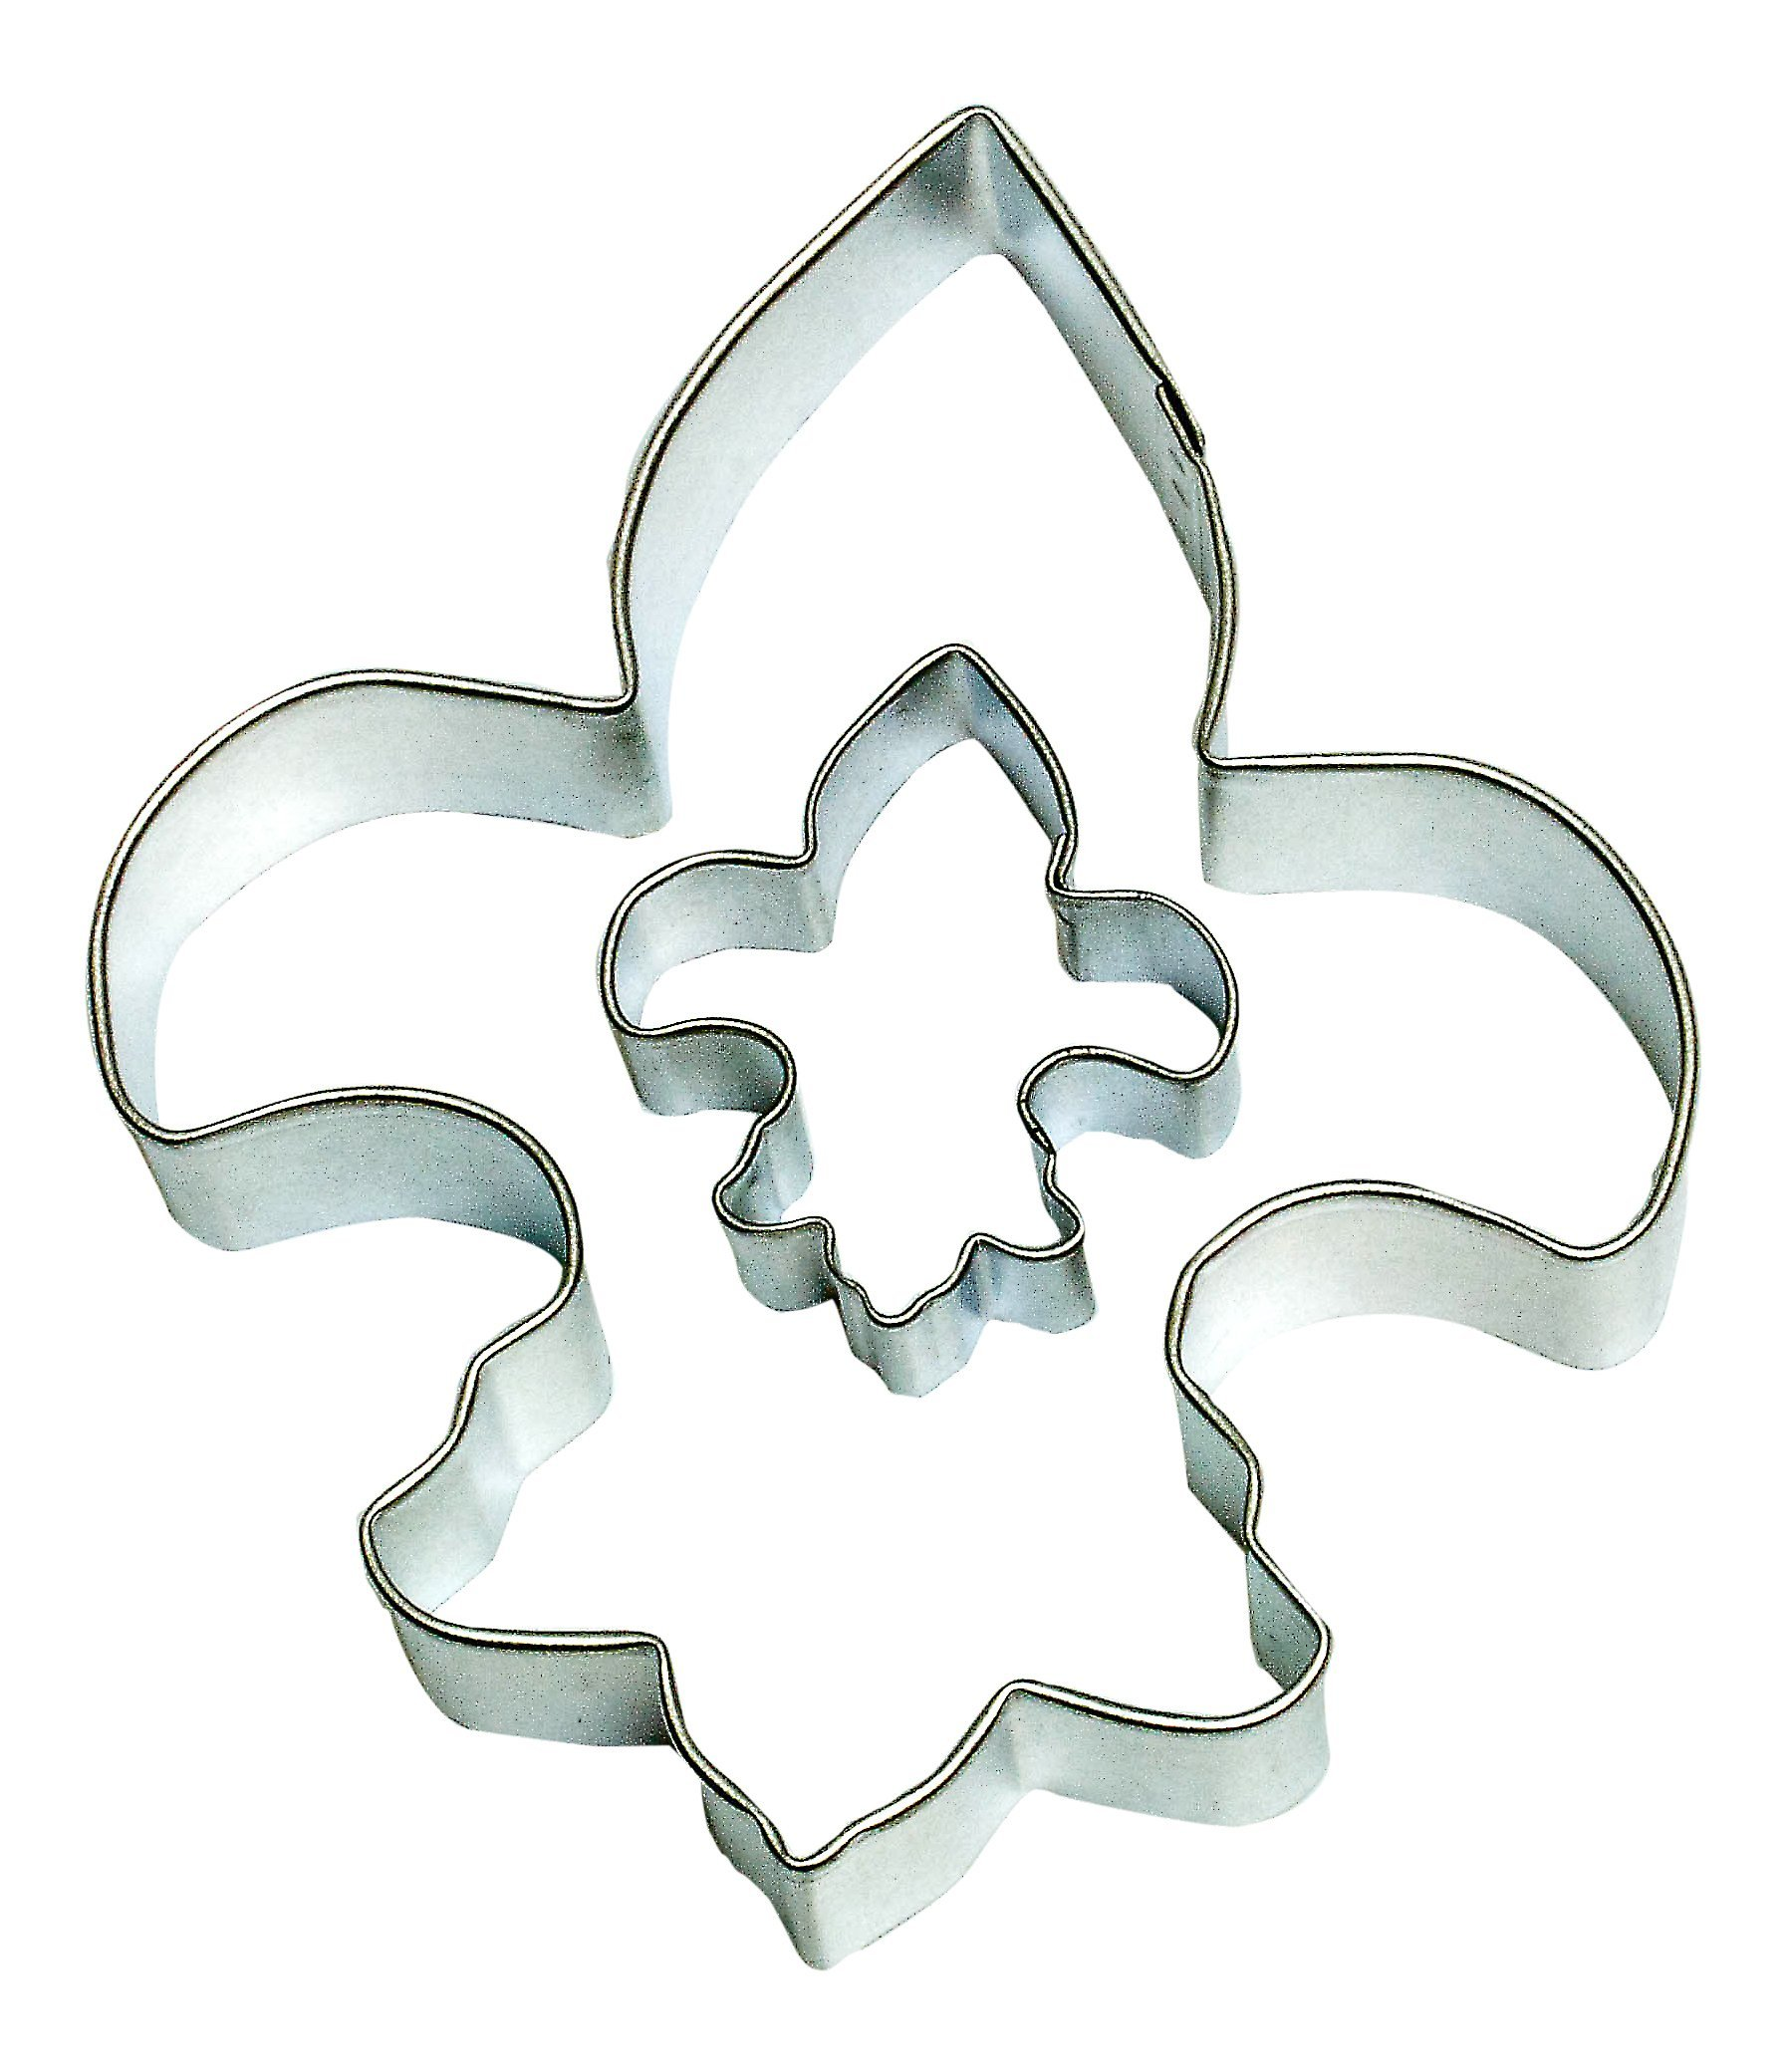 Cybrtrayd Parent/Child Cookie Cutter Set, 4.5-Inch, Fleur De Lis